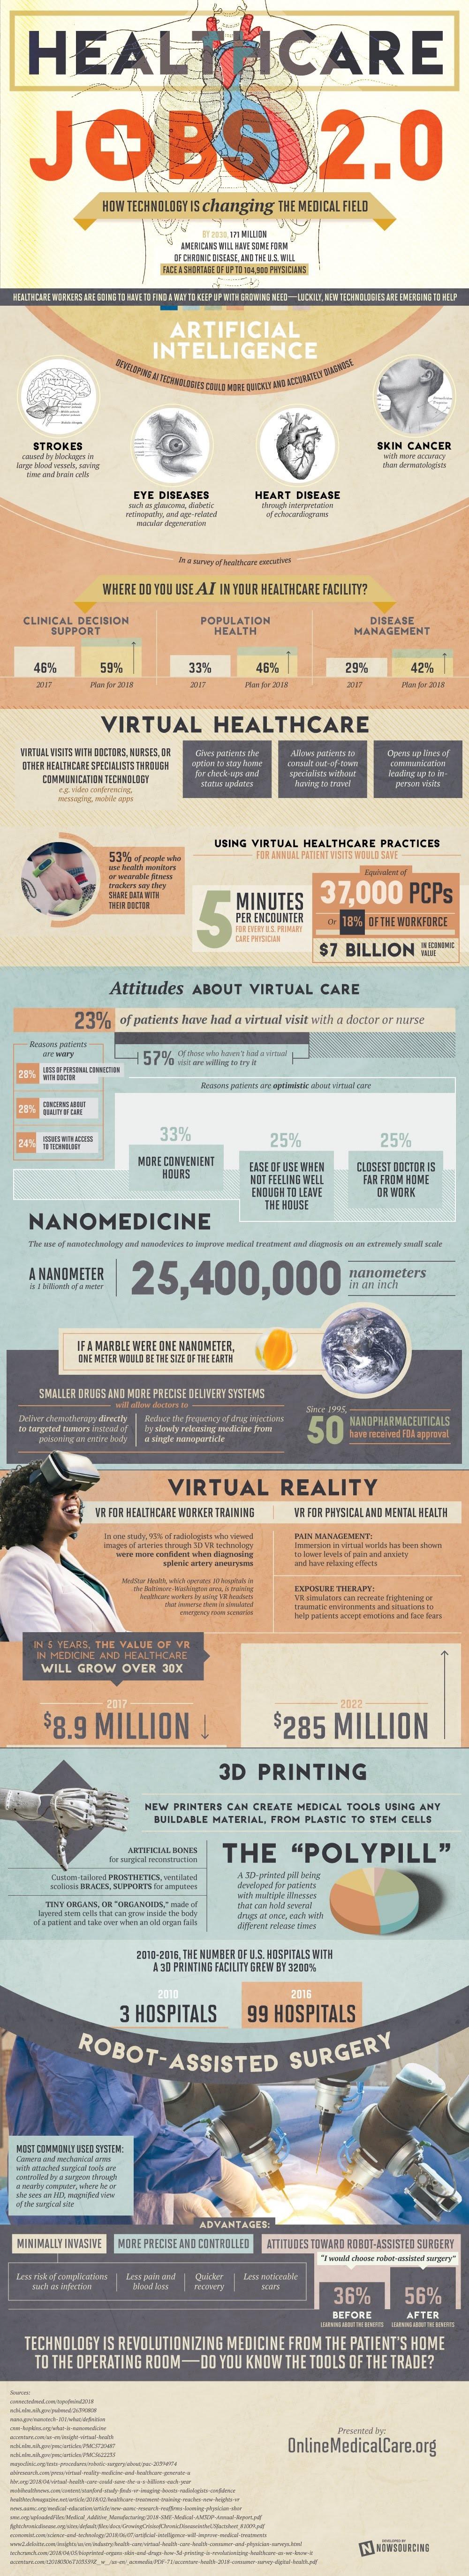 Healthcare Jobs info